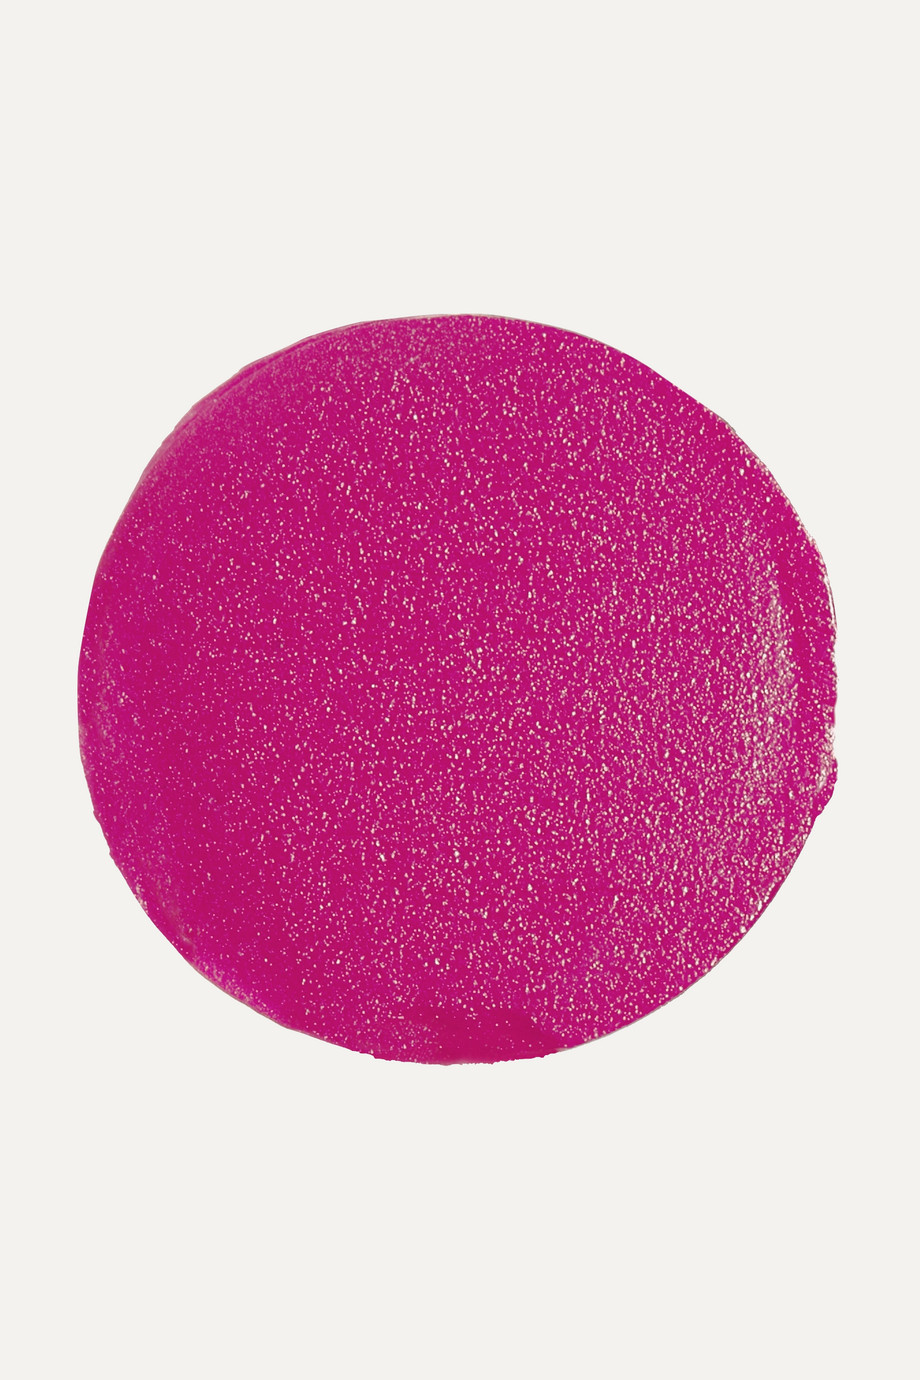 Gucci Beauty Rouge à Lèvres Voile – Love Before Breakfast 403 – Lippenstift